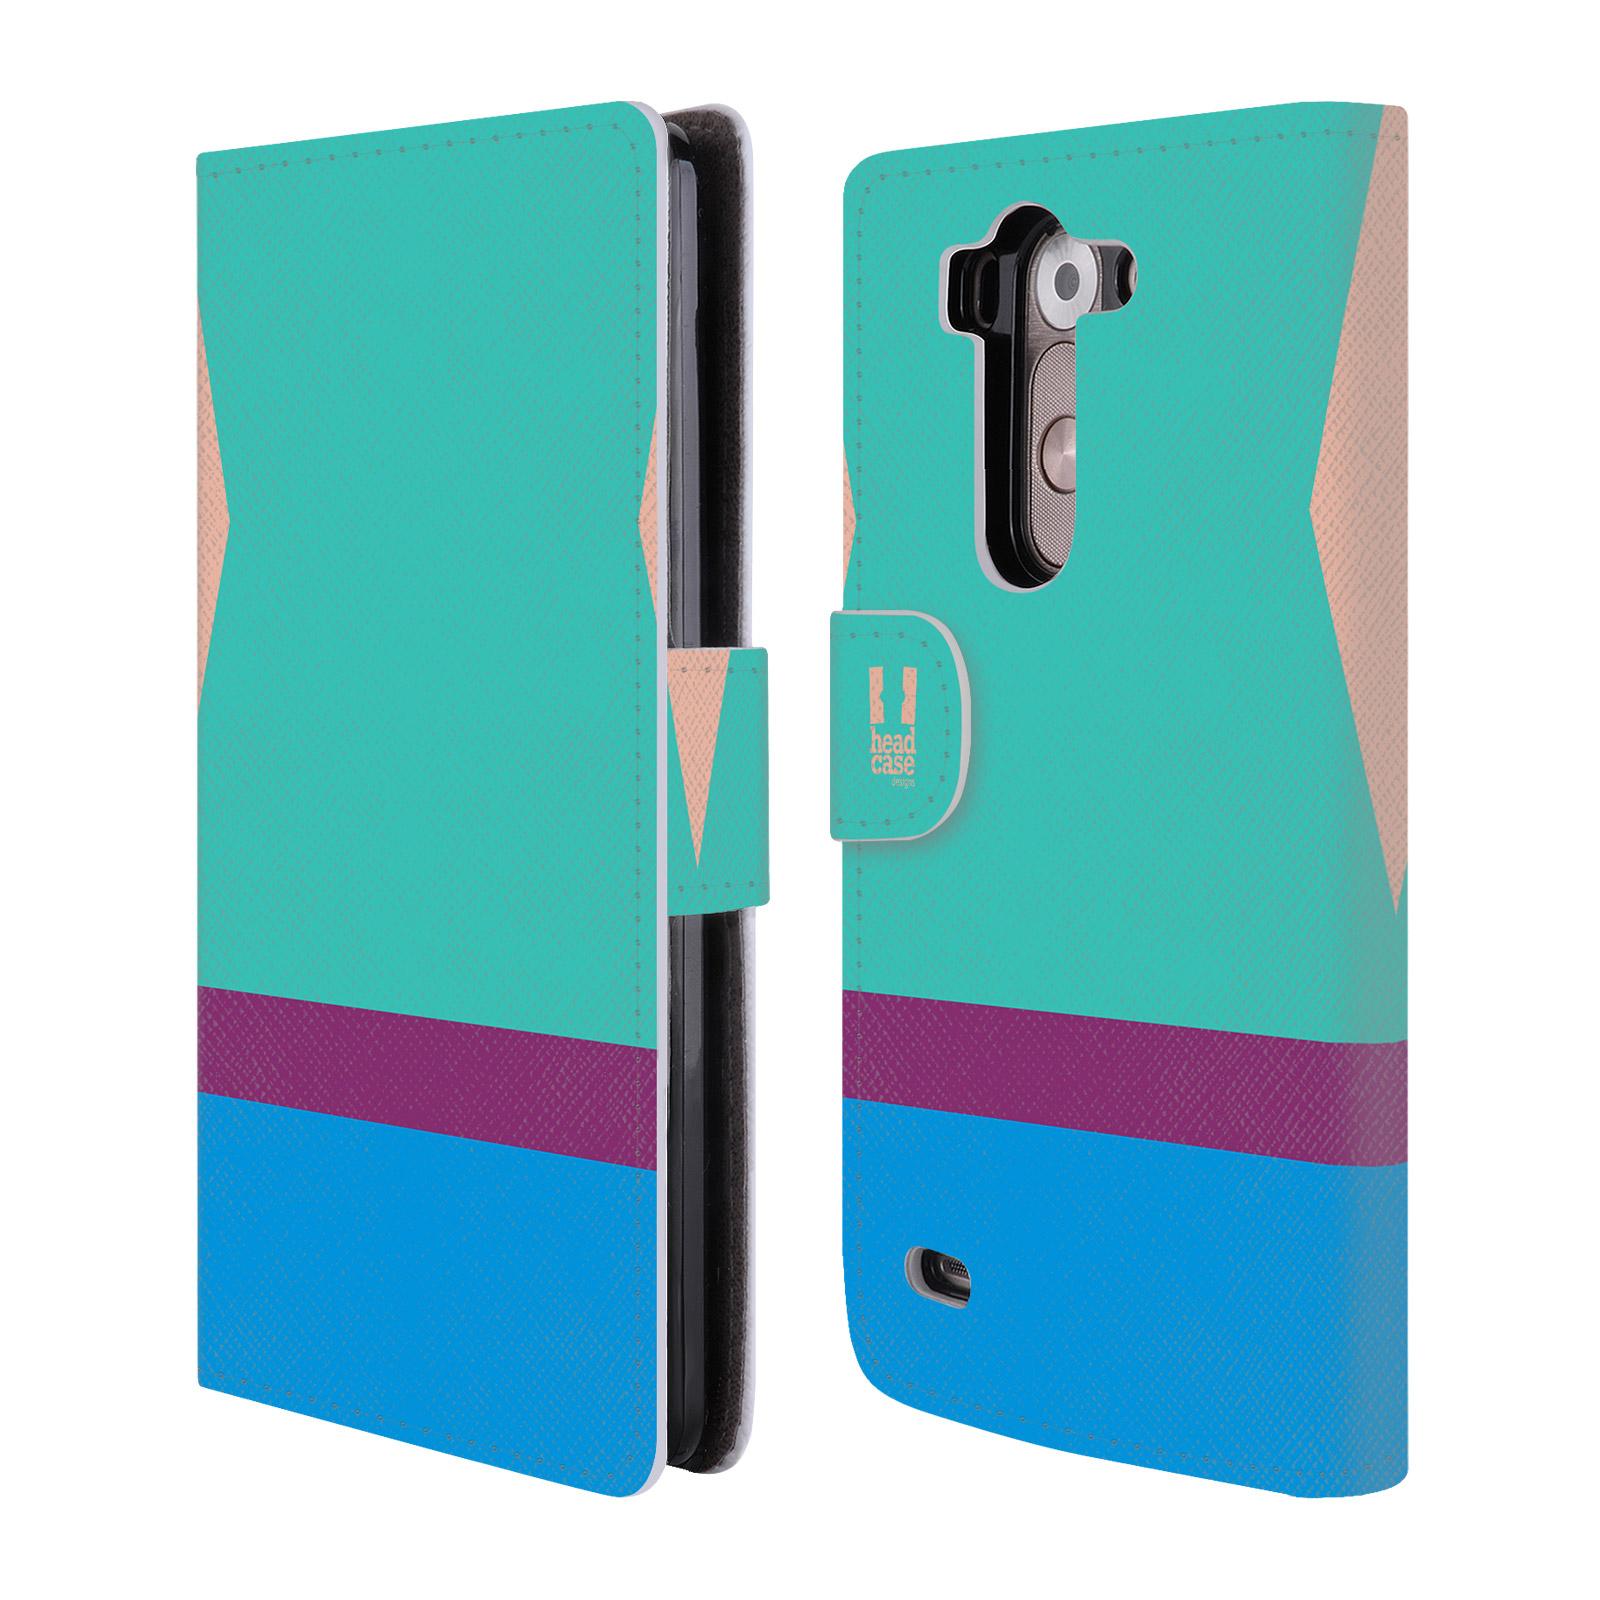 HEAD CASE Flipové pouzdro pro mobil LG G3s barevné tvary modrá a fialový pruh